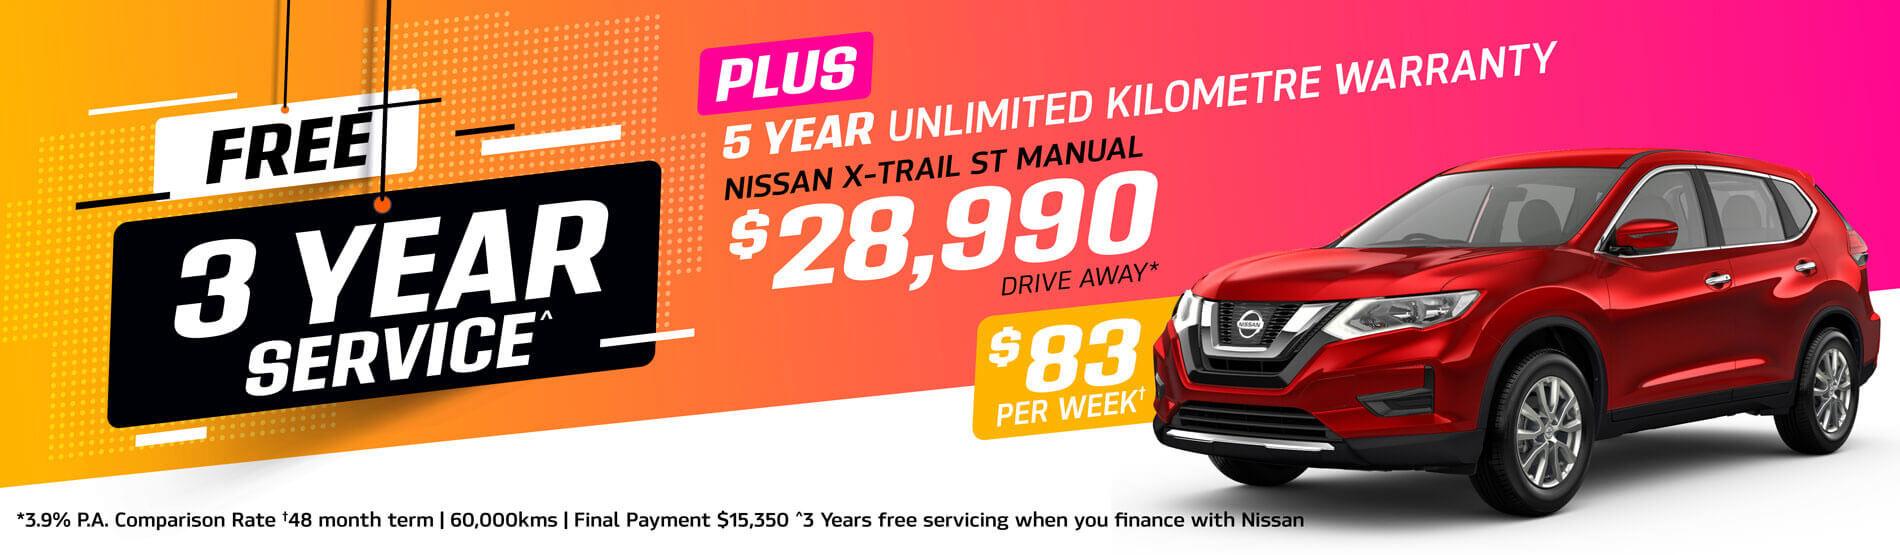 Parry NQ Nissan XTrail Offer